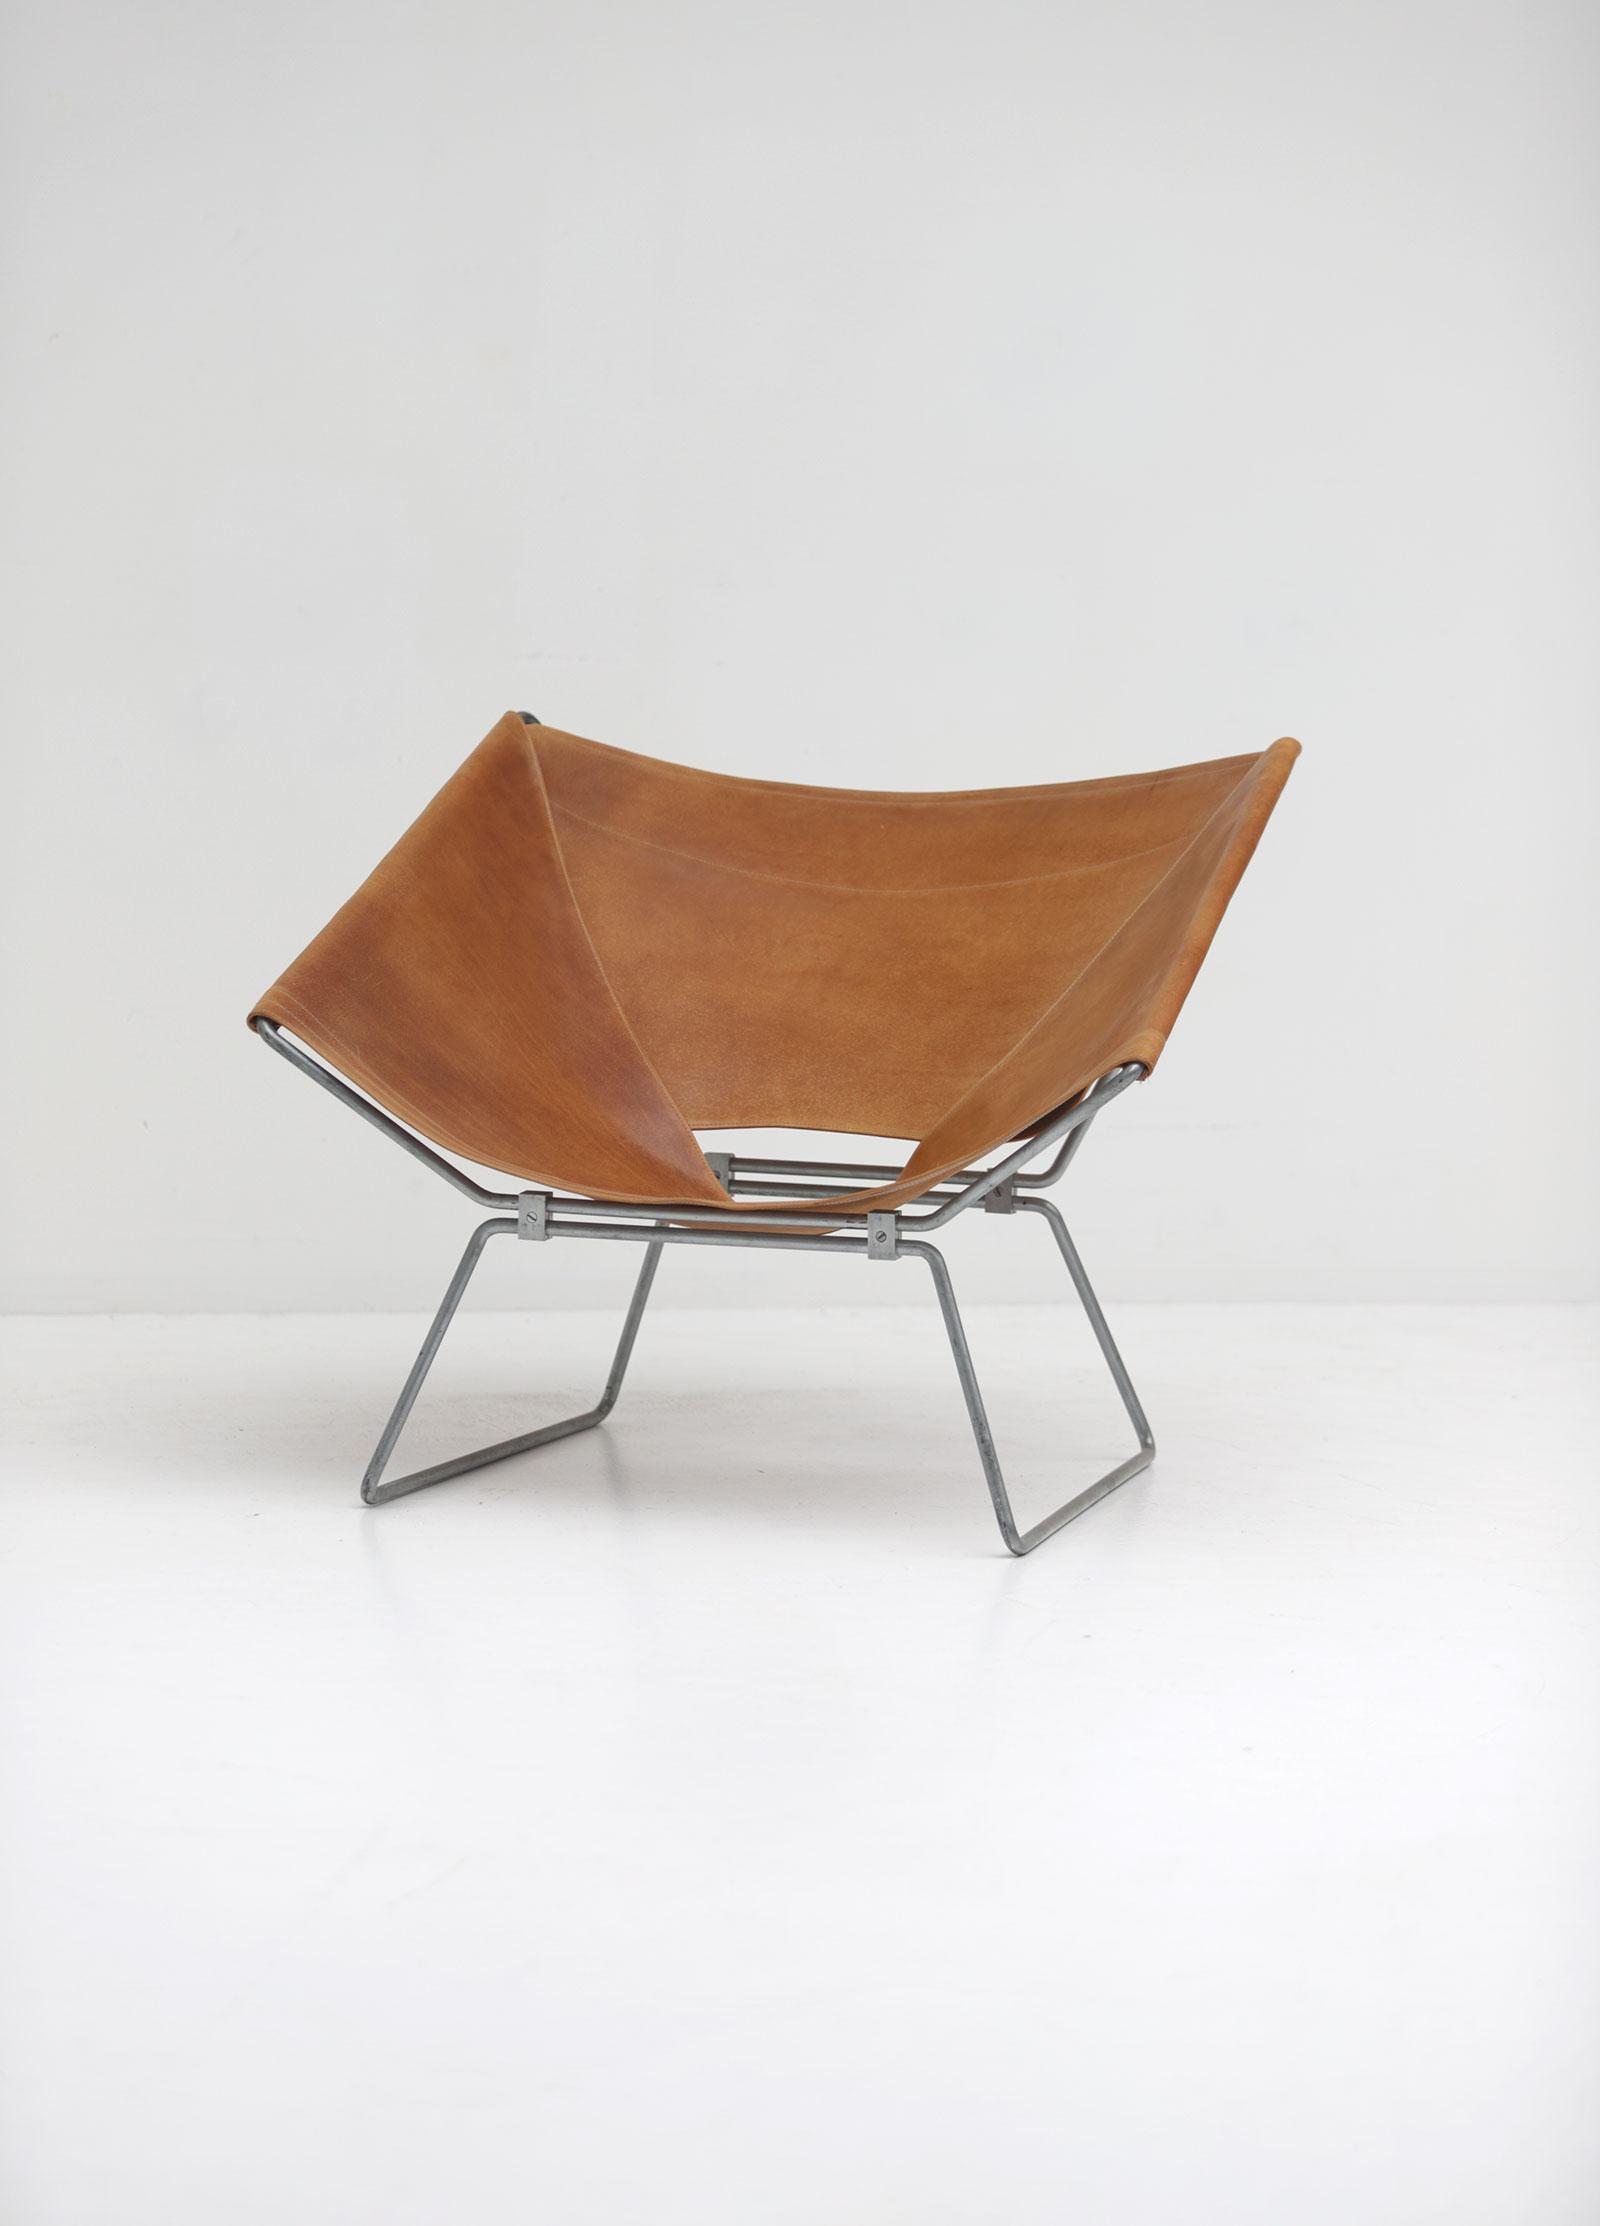 Pierre Paulin Original Leather Annau Chairimage 2